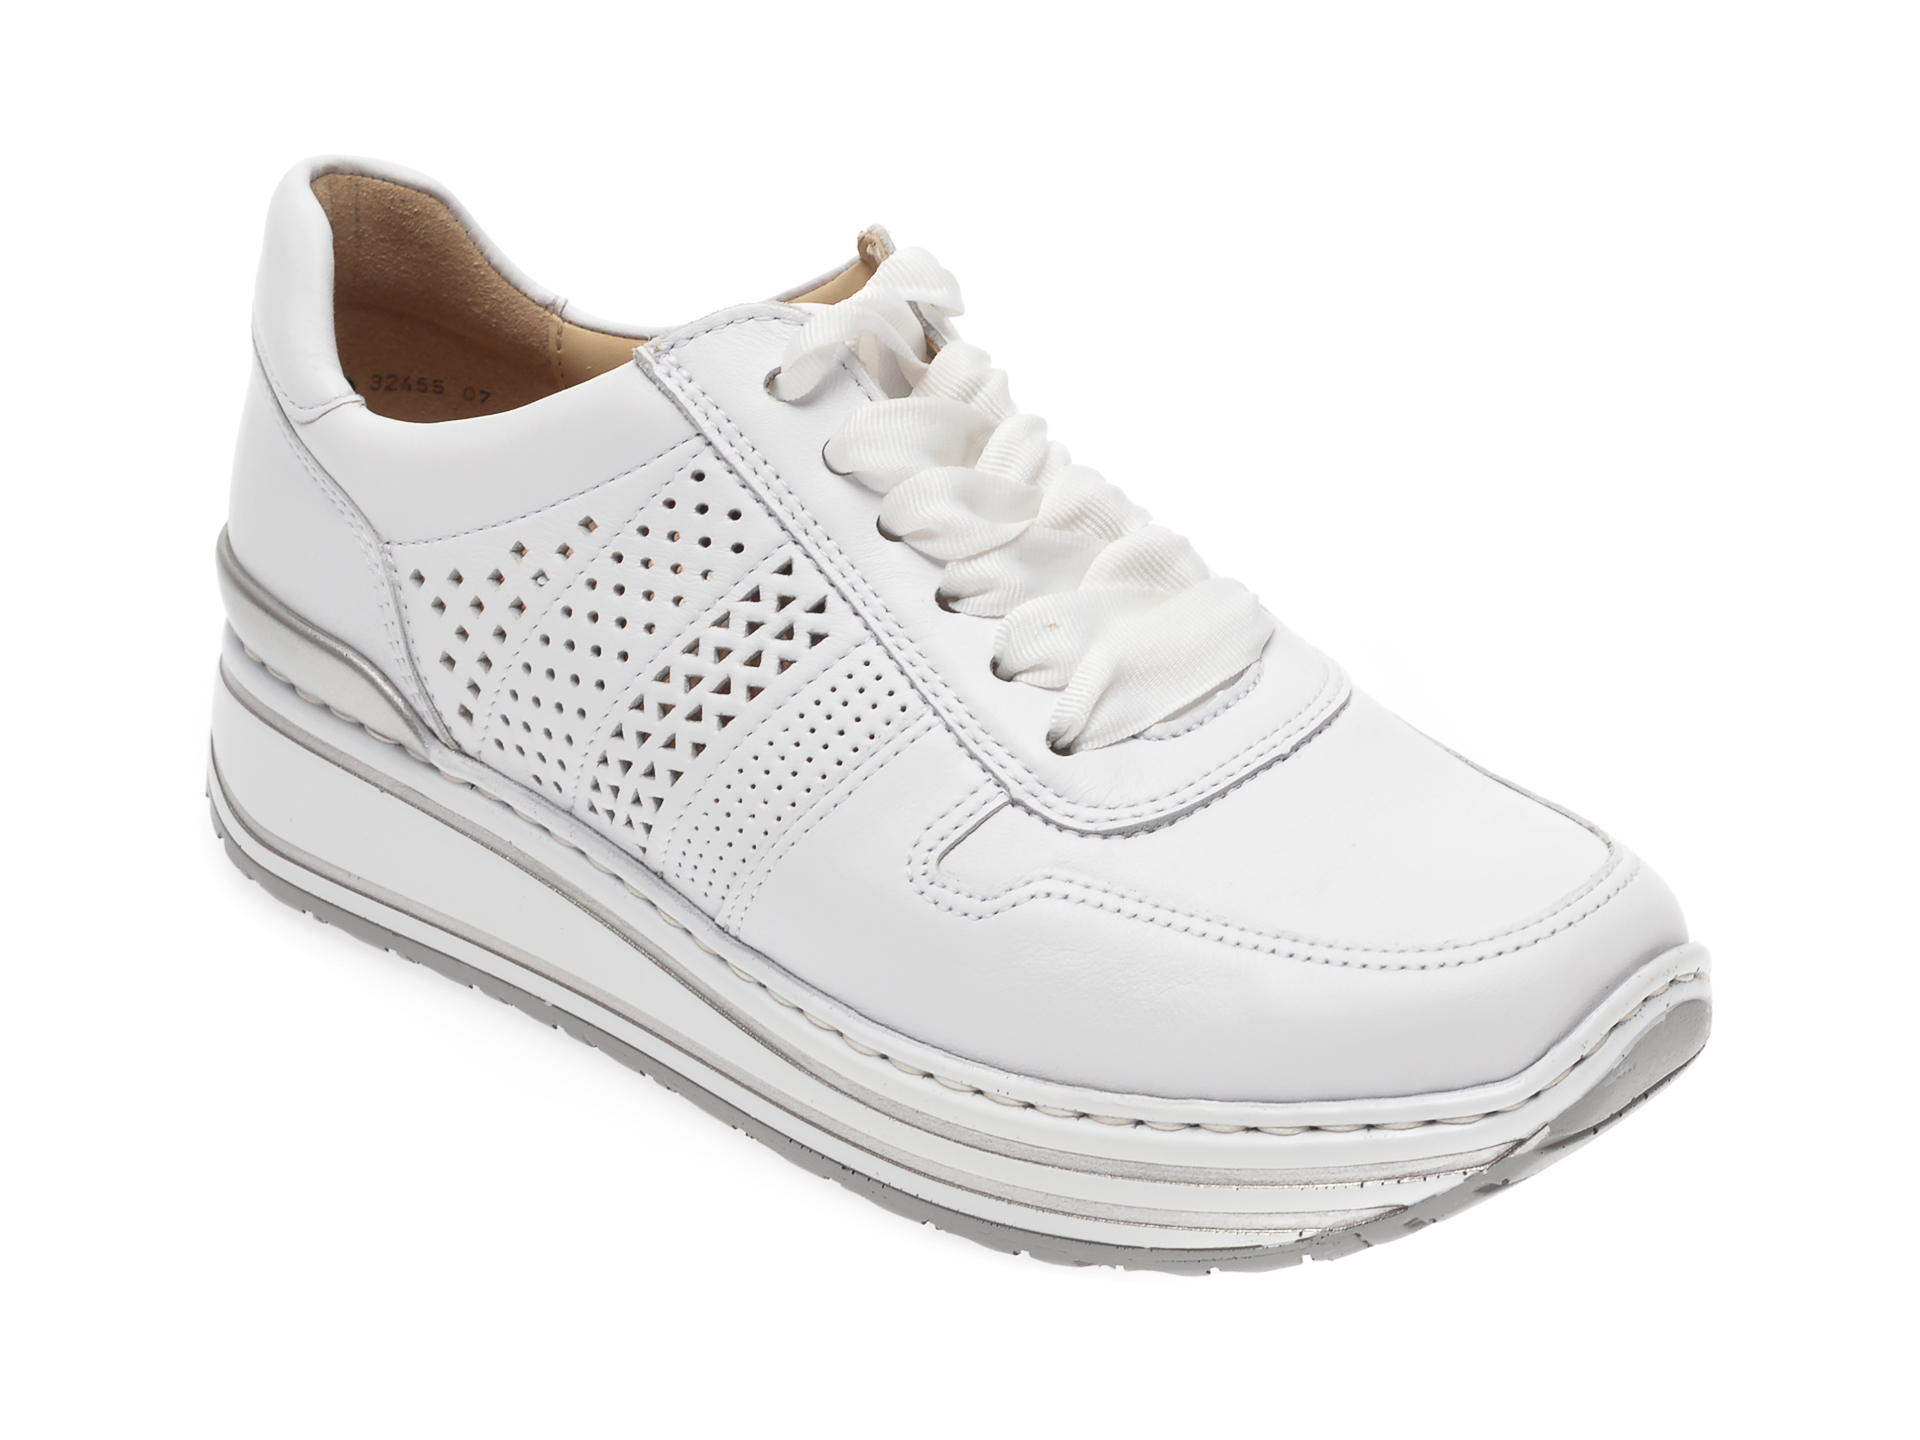 Pantofi sport ARA albi, 32465, din piele naturala